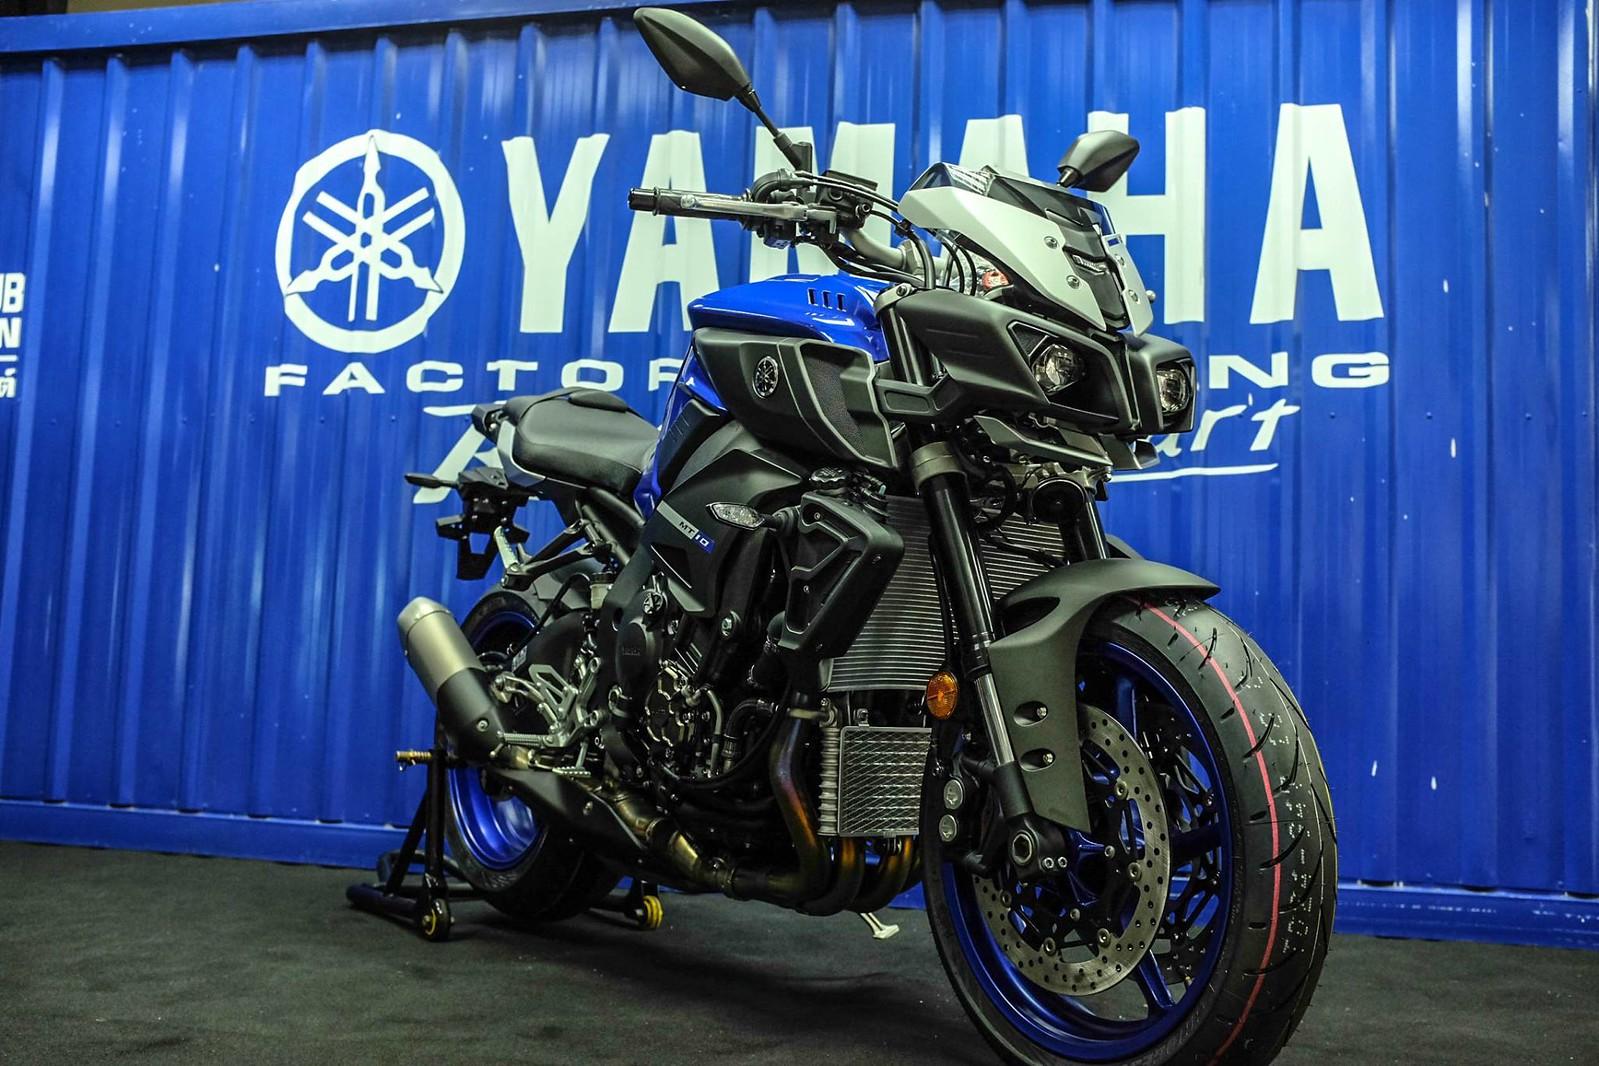 Yamaha mt 10 619 000 bht for Yamaha mt10 price